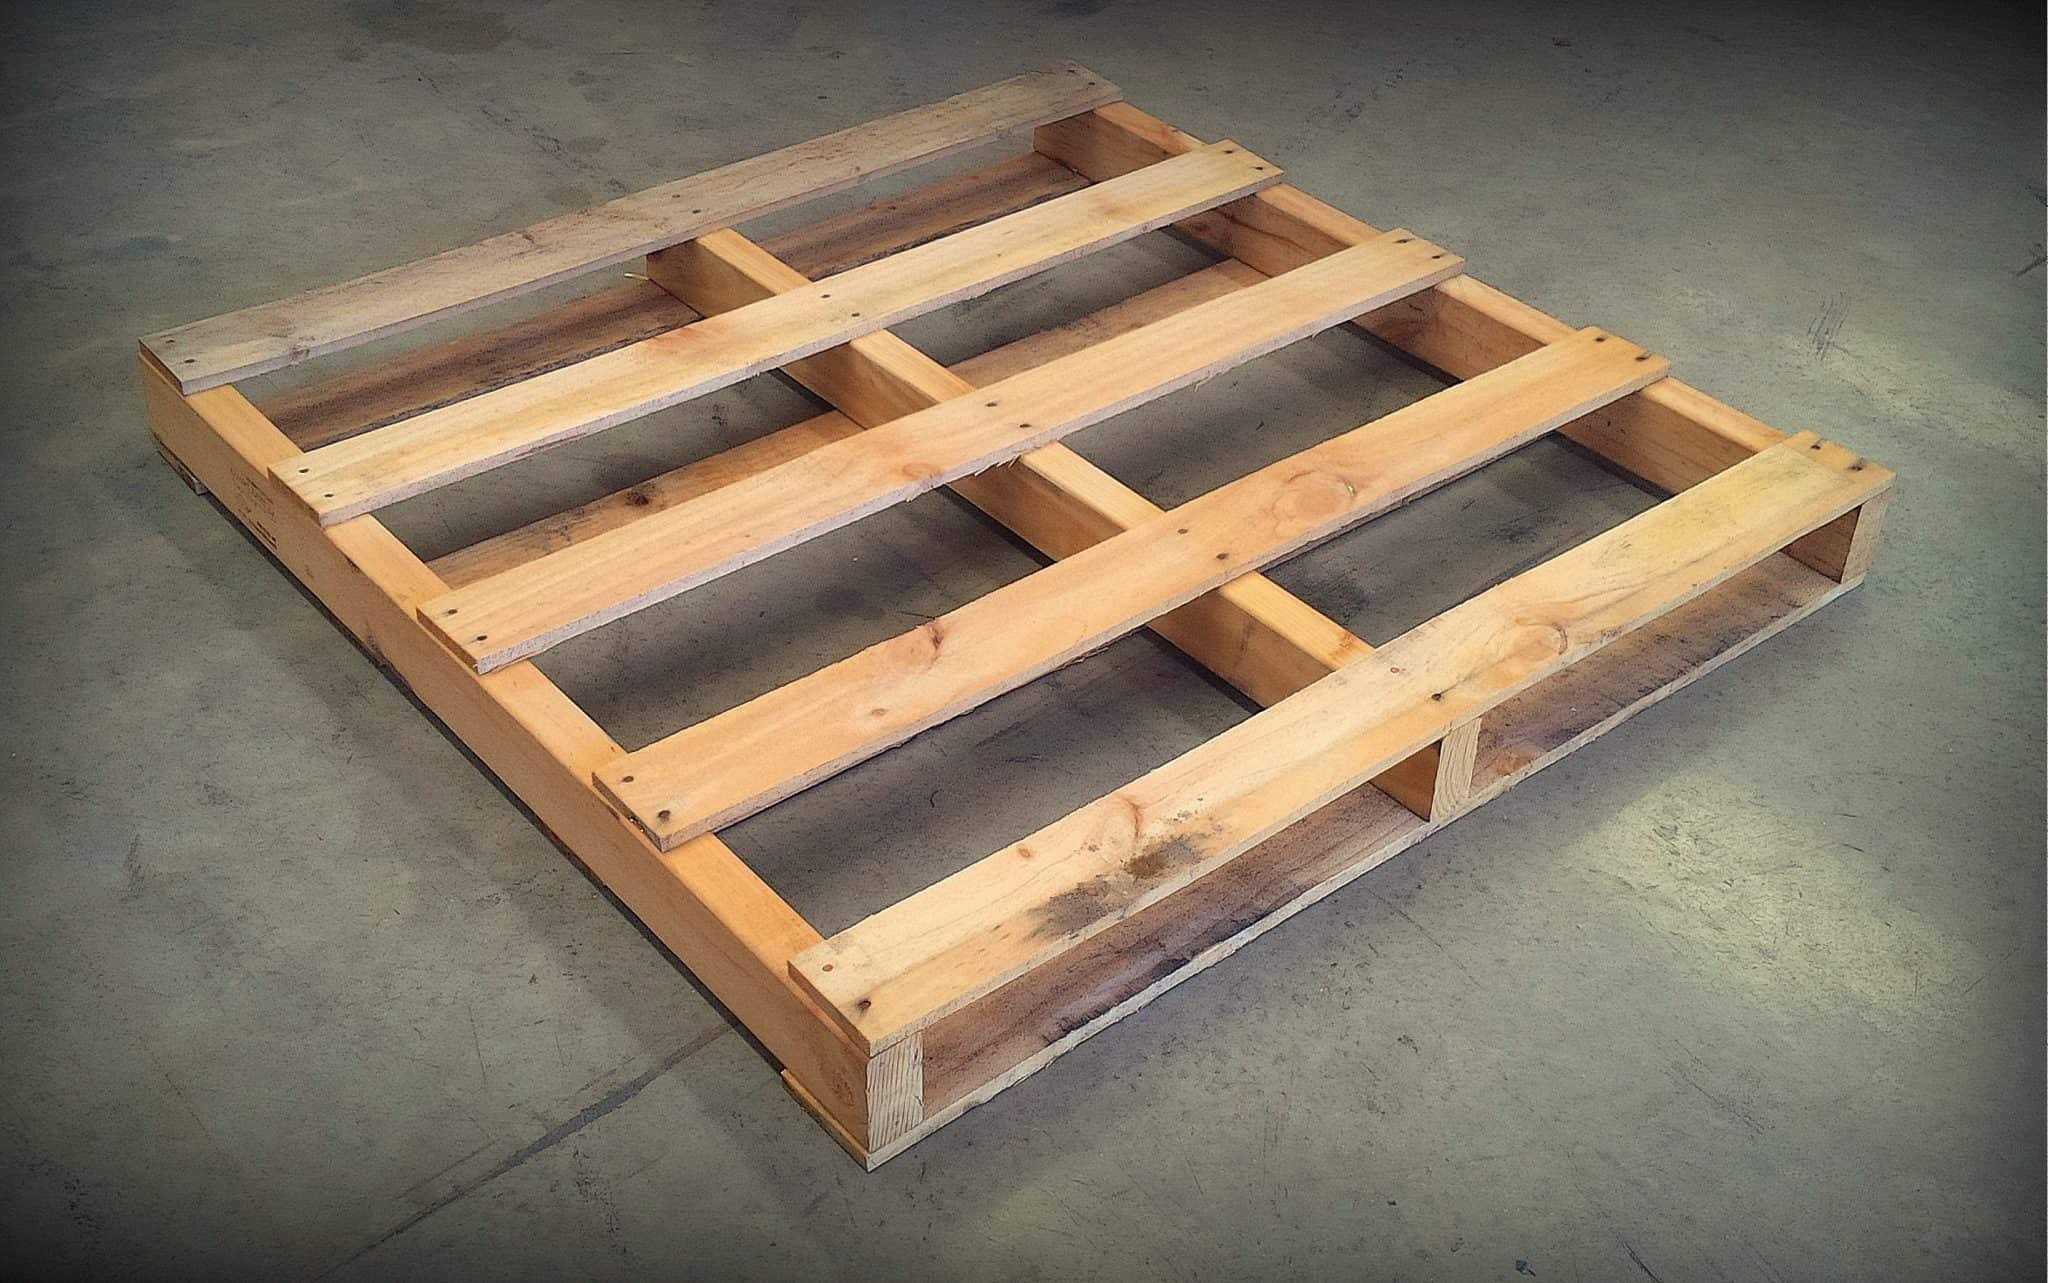 Timber frame base pallet on concrete floor